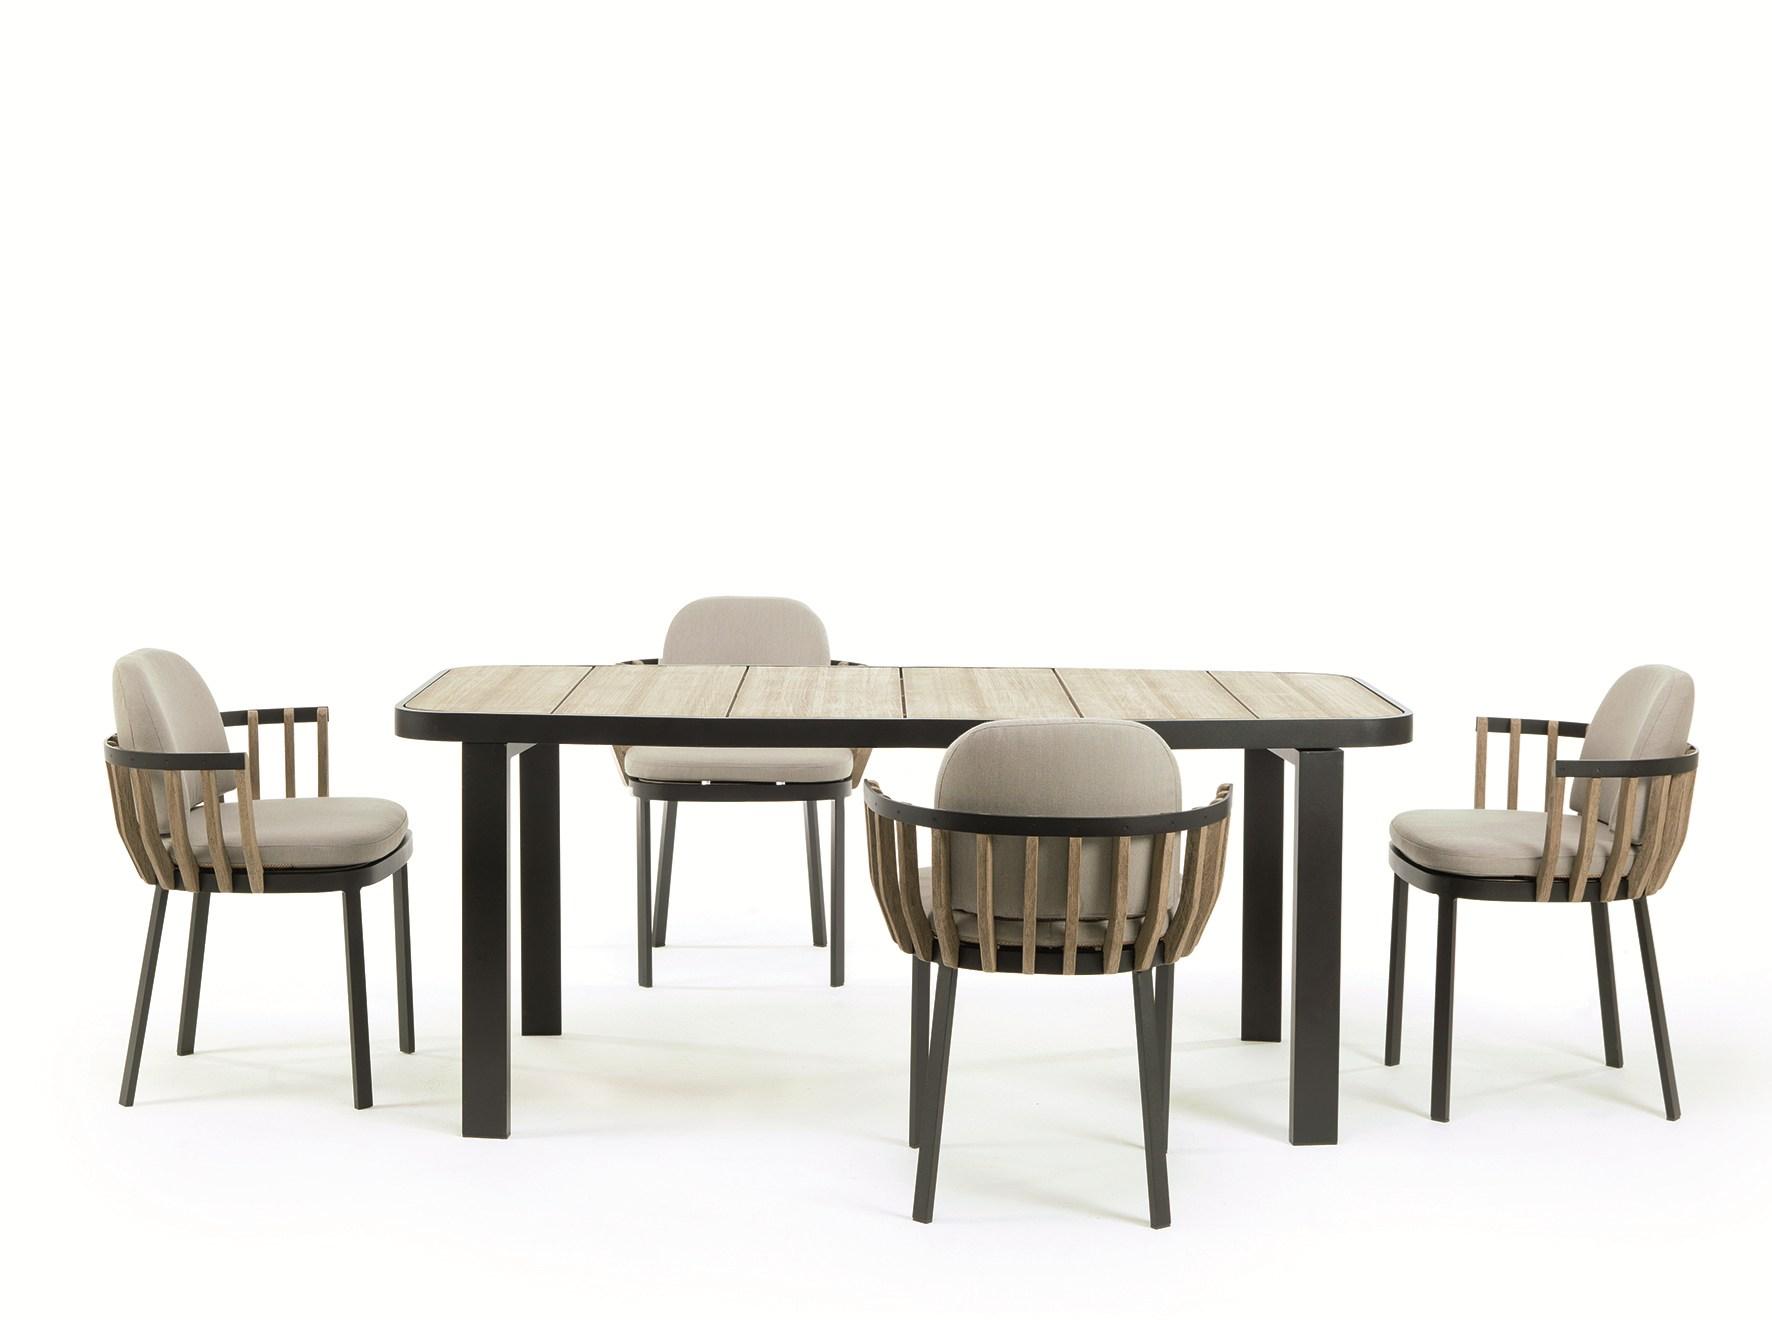 squarcina ethimo swing sedia squarcina. Black Bedroom Furniture Sets. Home Design Ideas